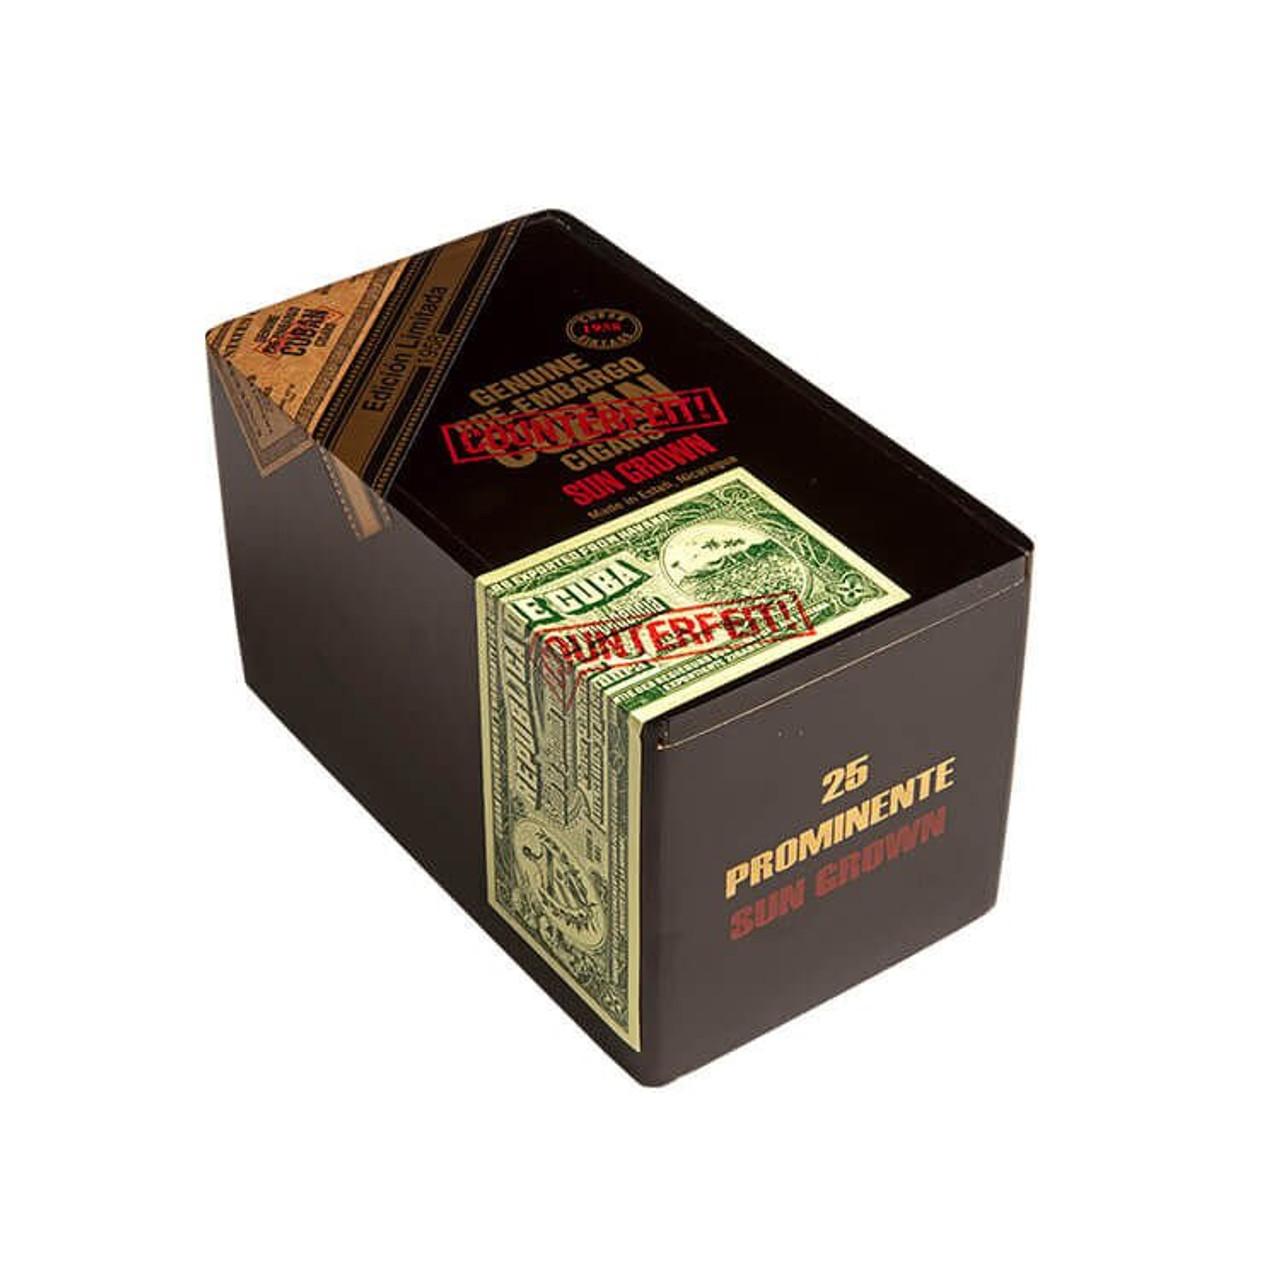 Genuine Pre-Embargo C.C. Sun Grown 1958 Sesenta Cigars - 6.0 x 60 (Box of 25)